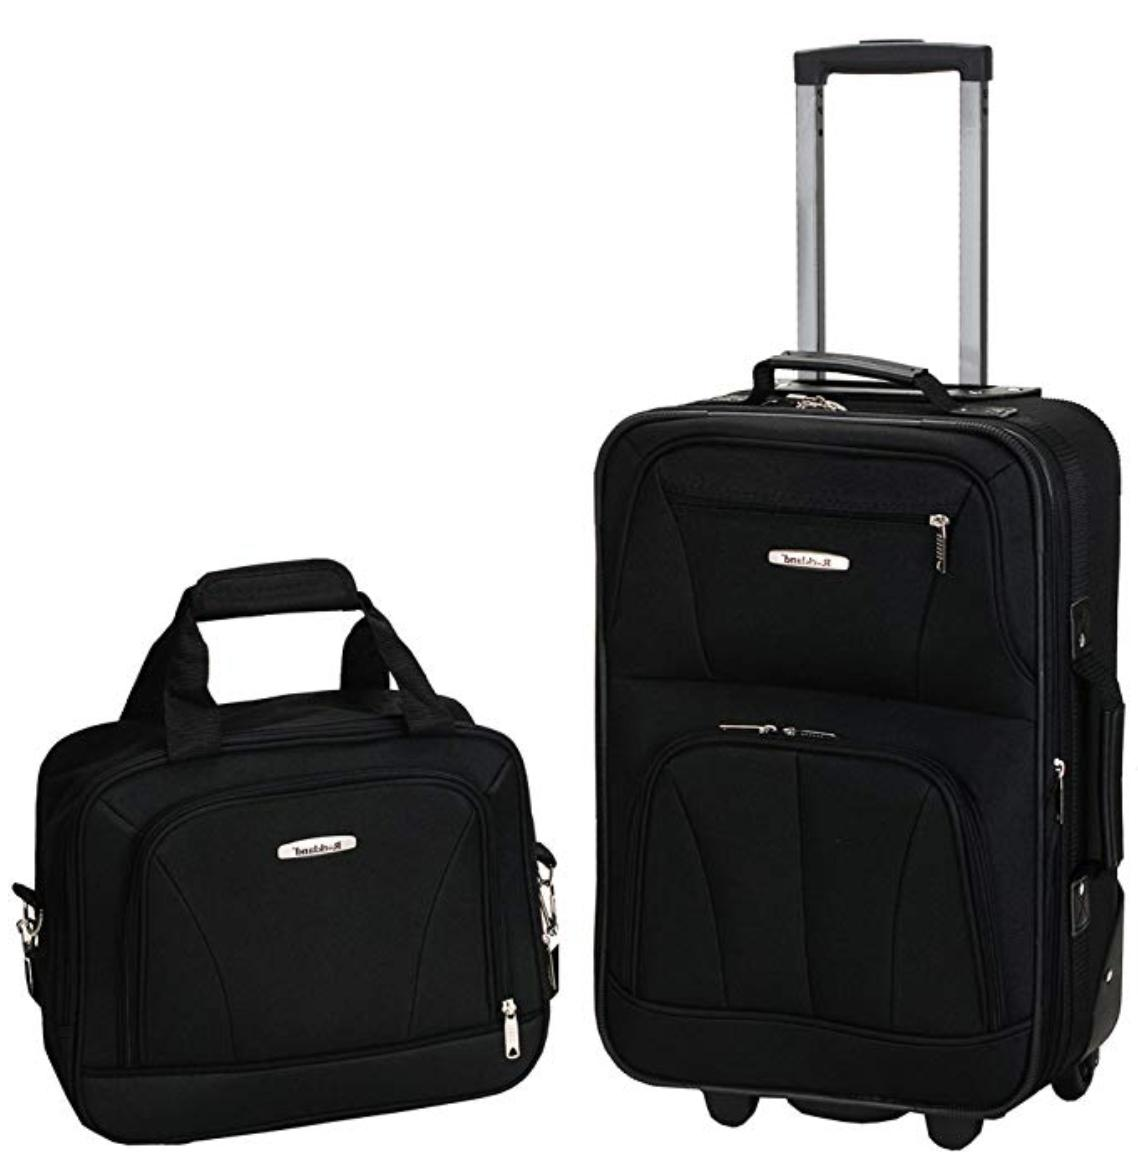 luggage 2 piece set choose 14 colors